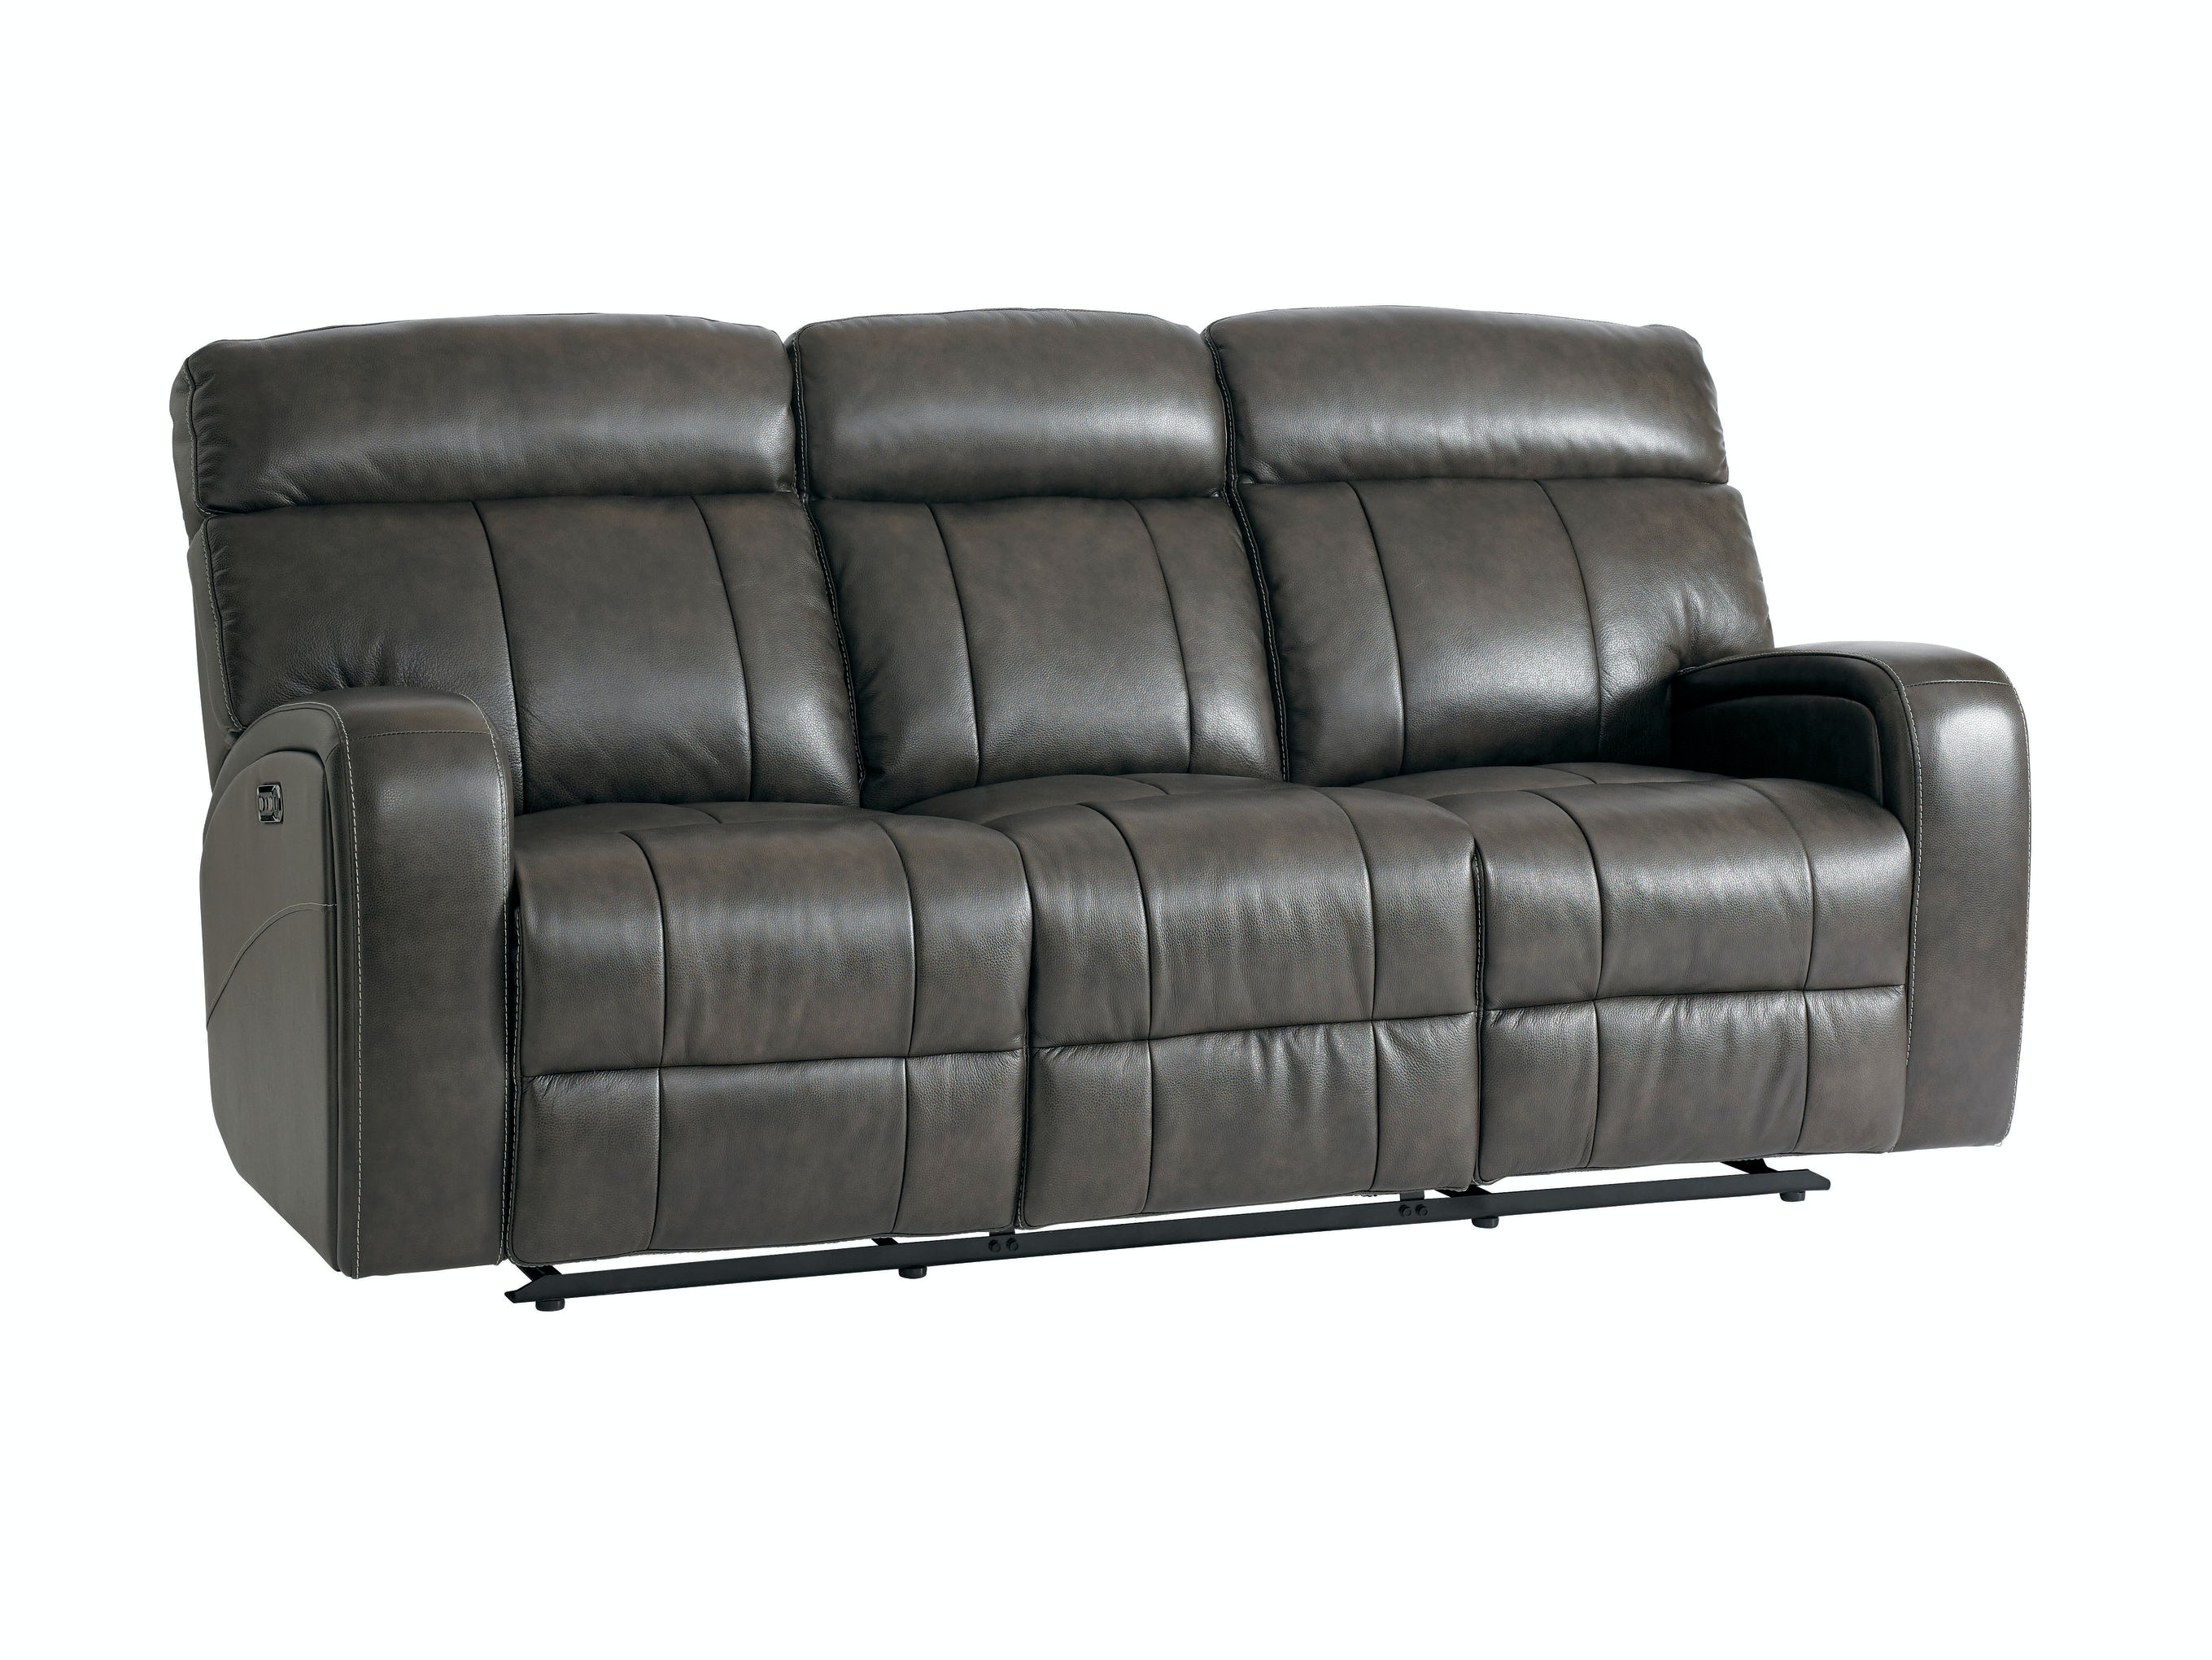 bassett beaumont power reclining sofa 742062 talsma furniture rh talsmafurniture com leather power reclining sofa with console leather power reclining sofa with console